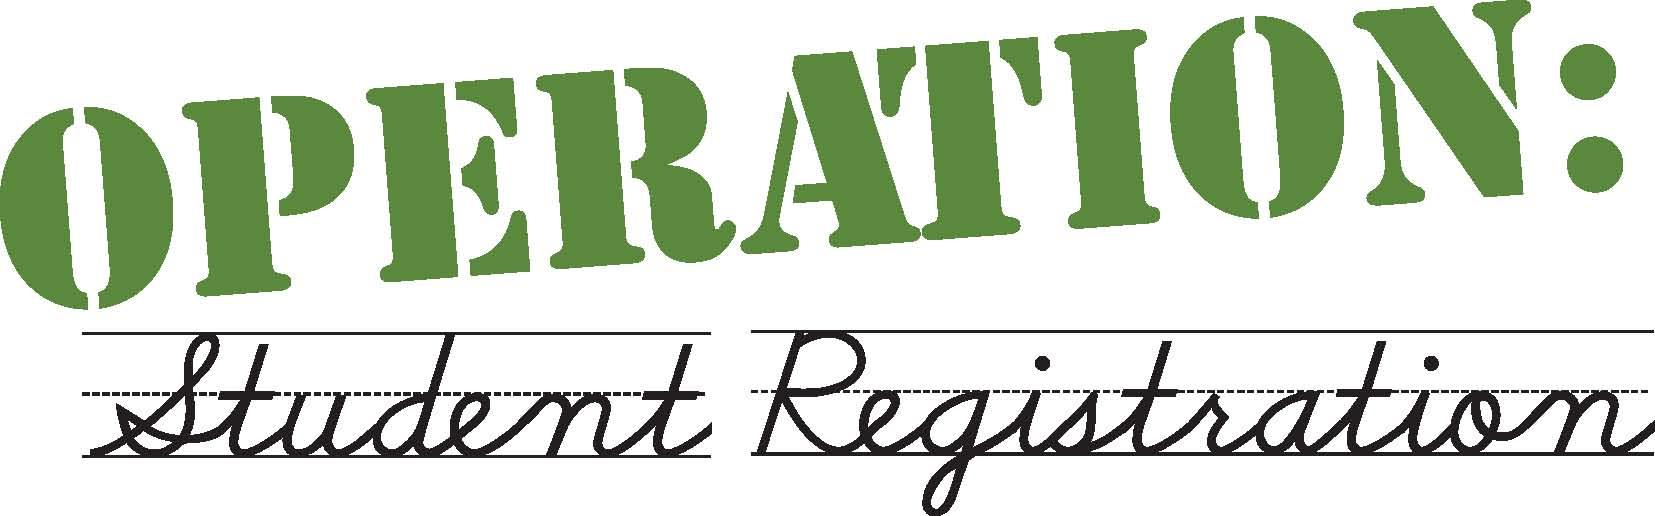 Operation Student Registration